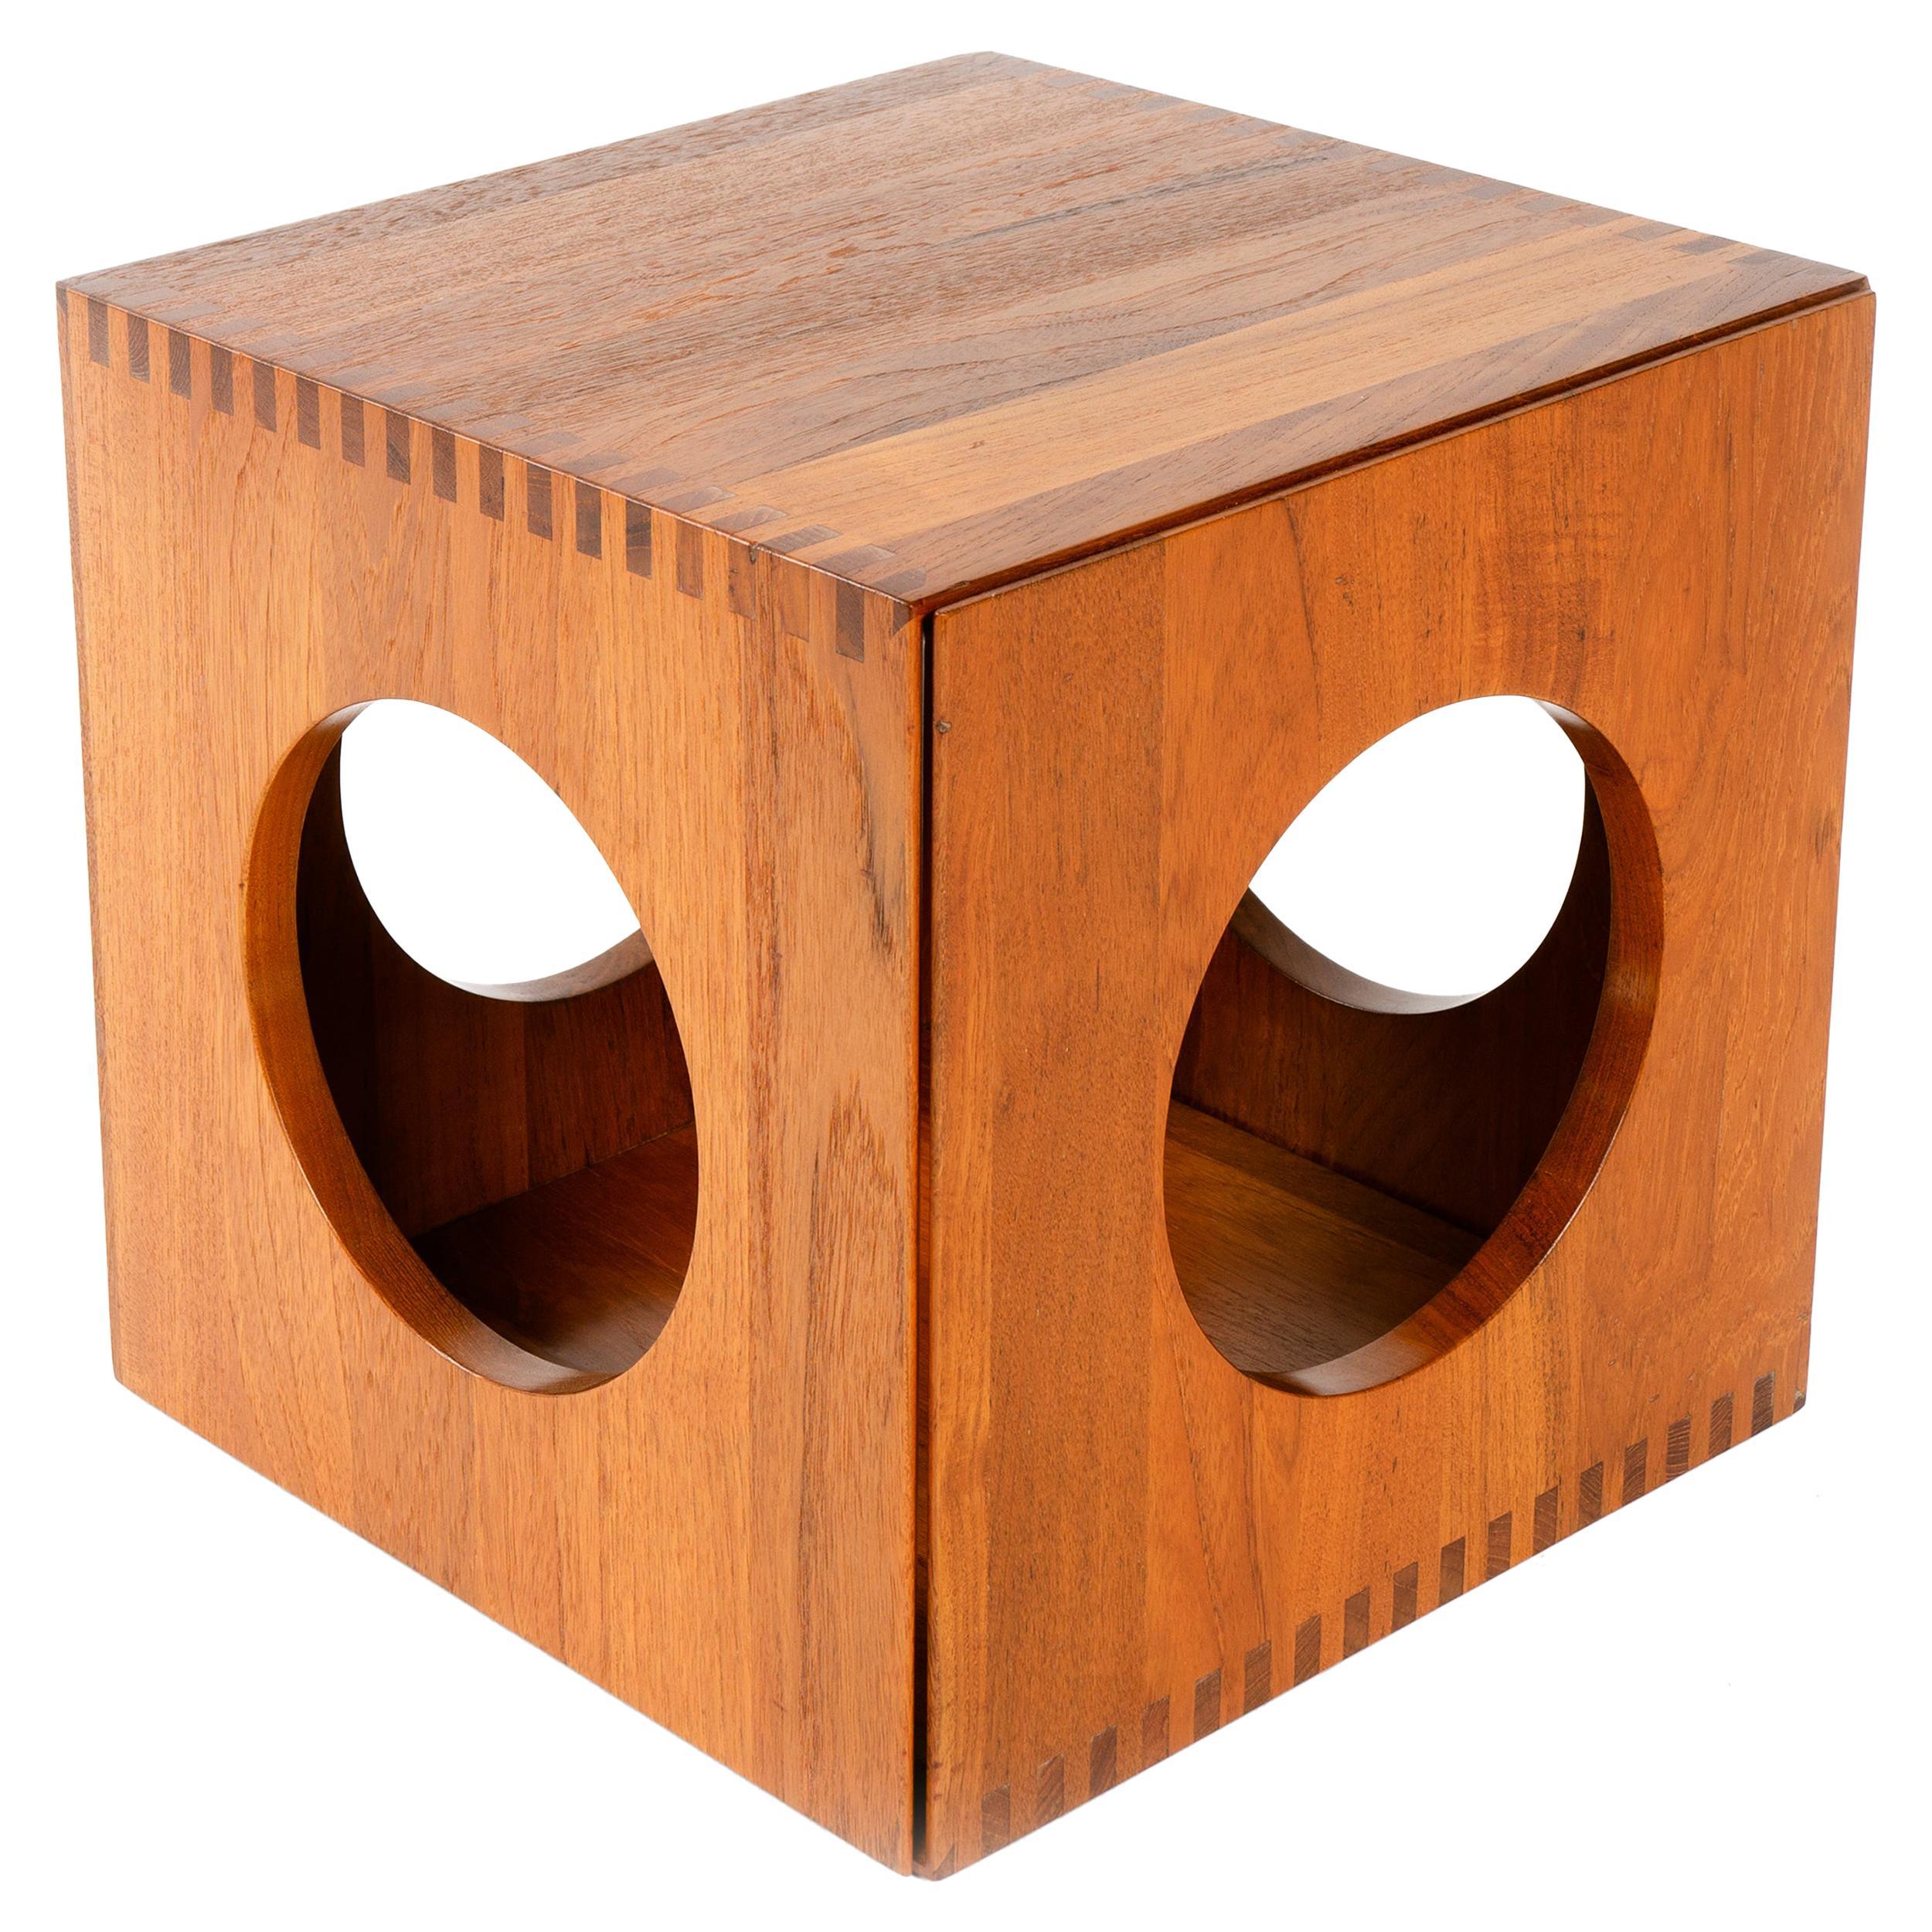 1950s Danish Cube End Tables by Jens H. Quistgaard for Richard Nissen